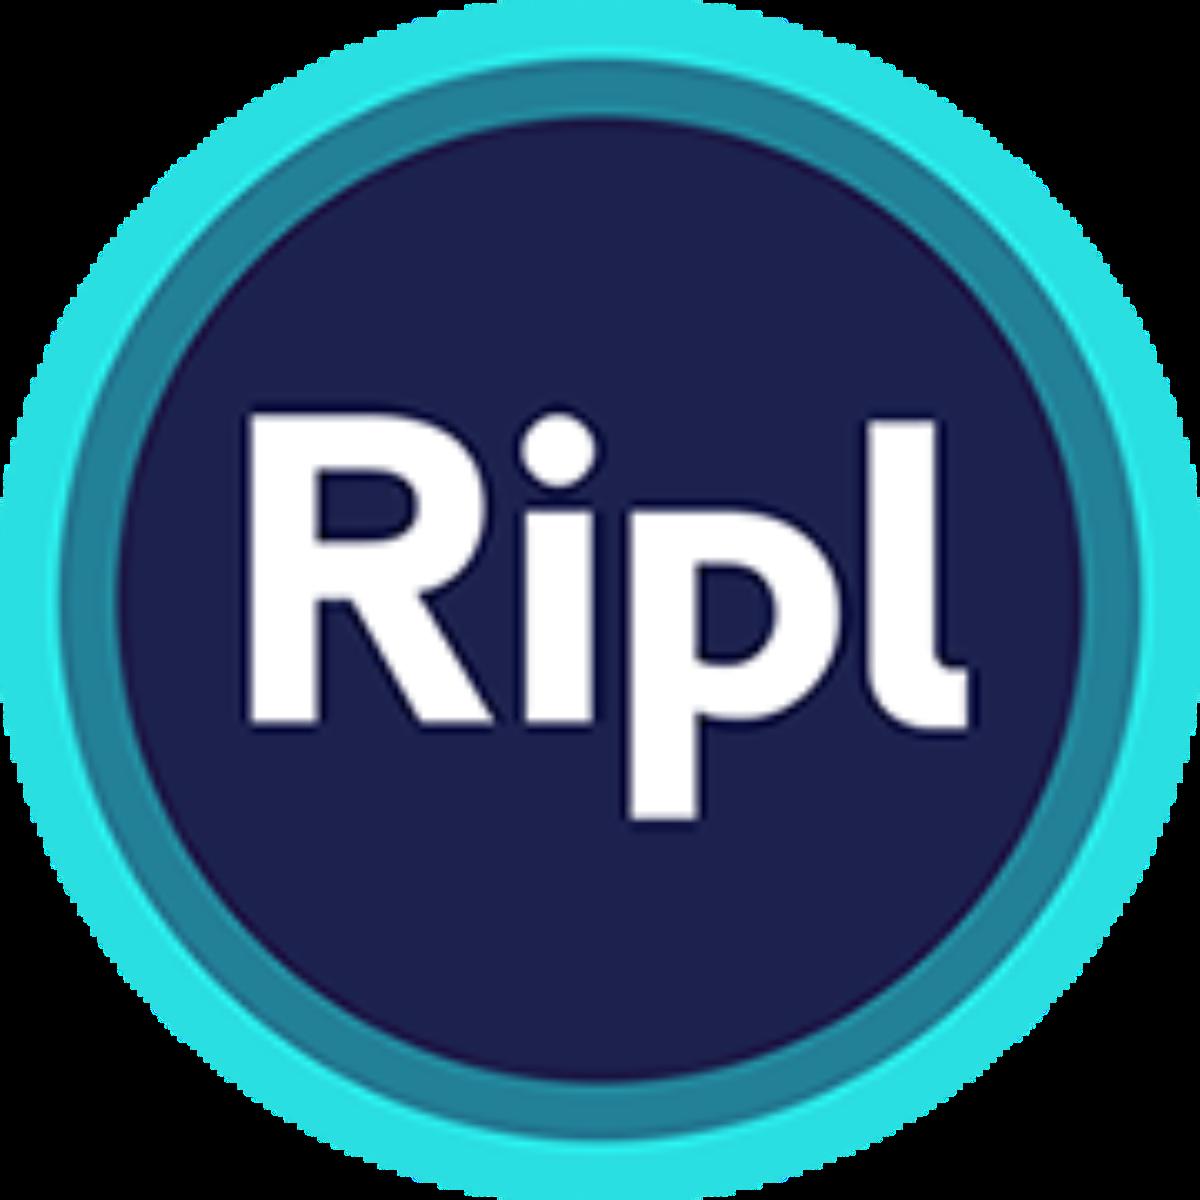 ripl_logo_180.png